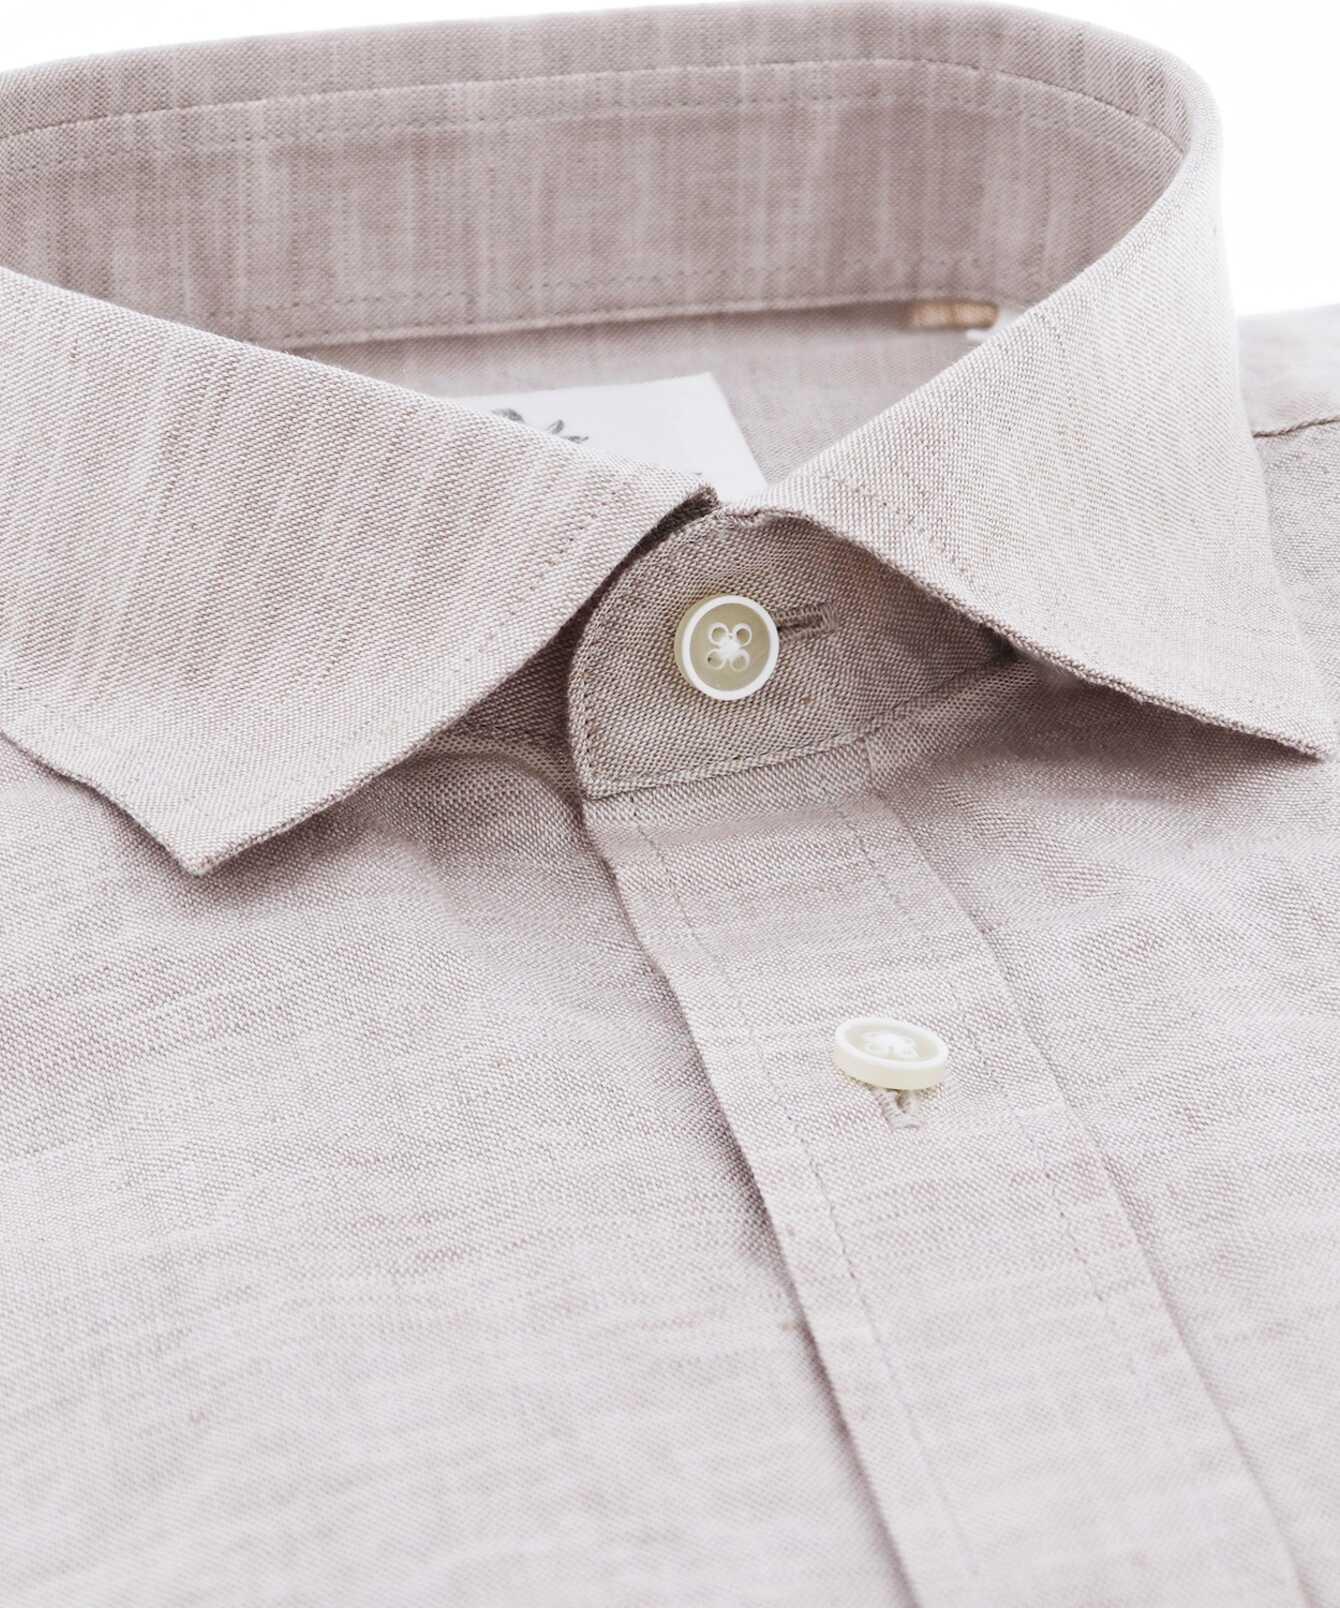 Skjorta Portofino Linne Beige The Shirt Factory